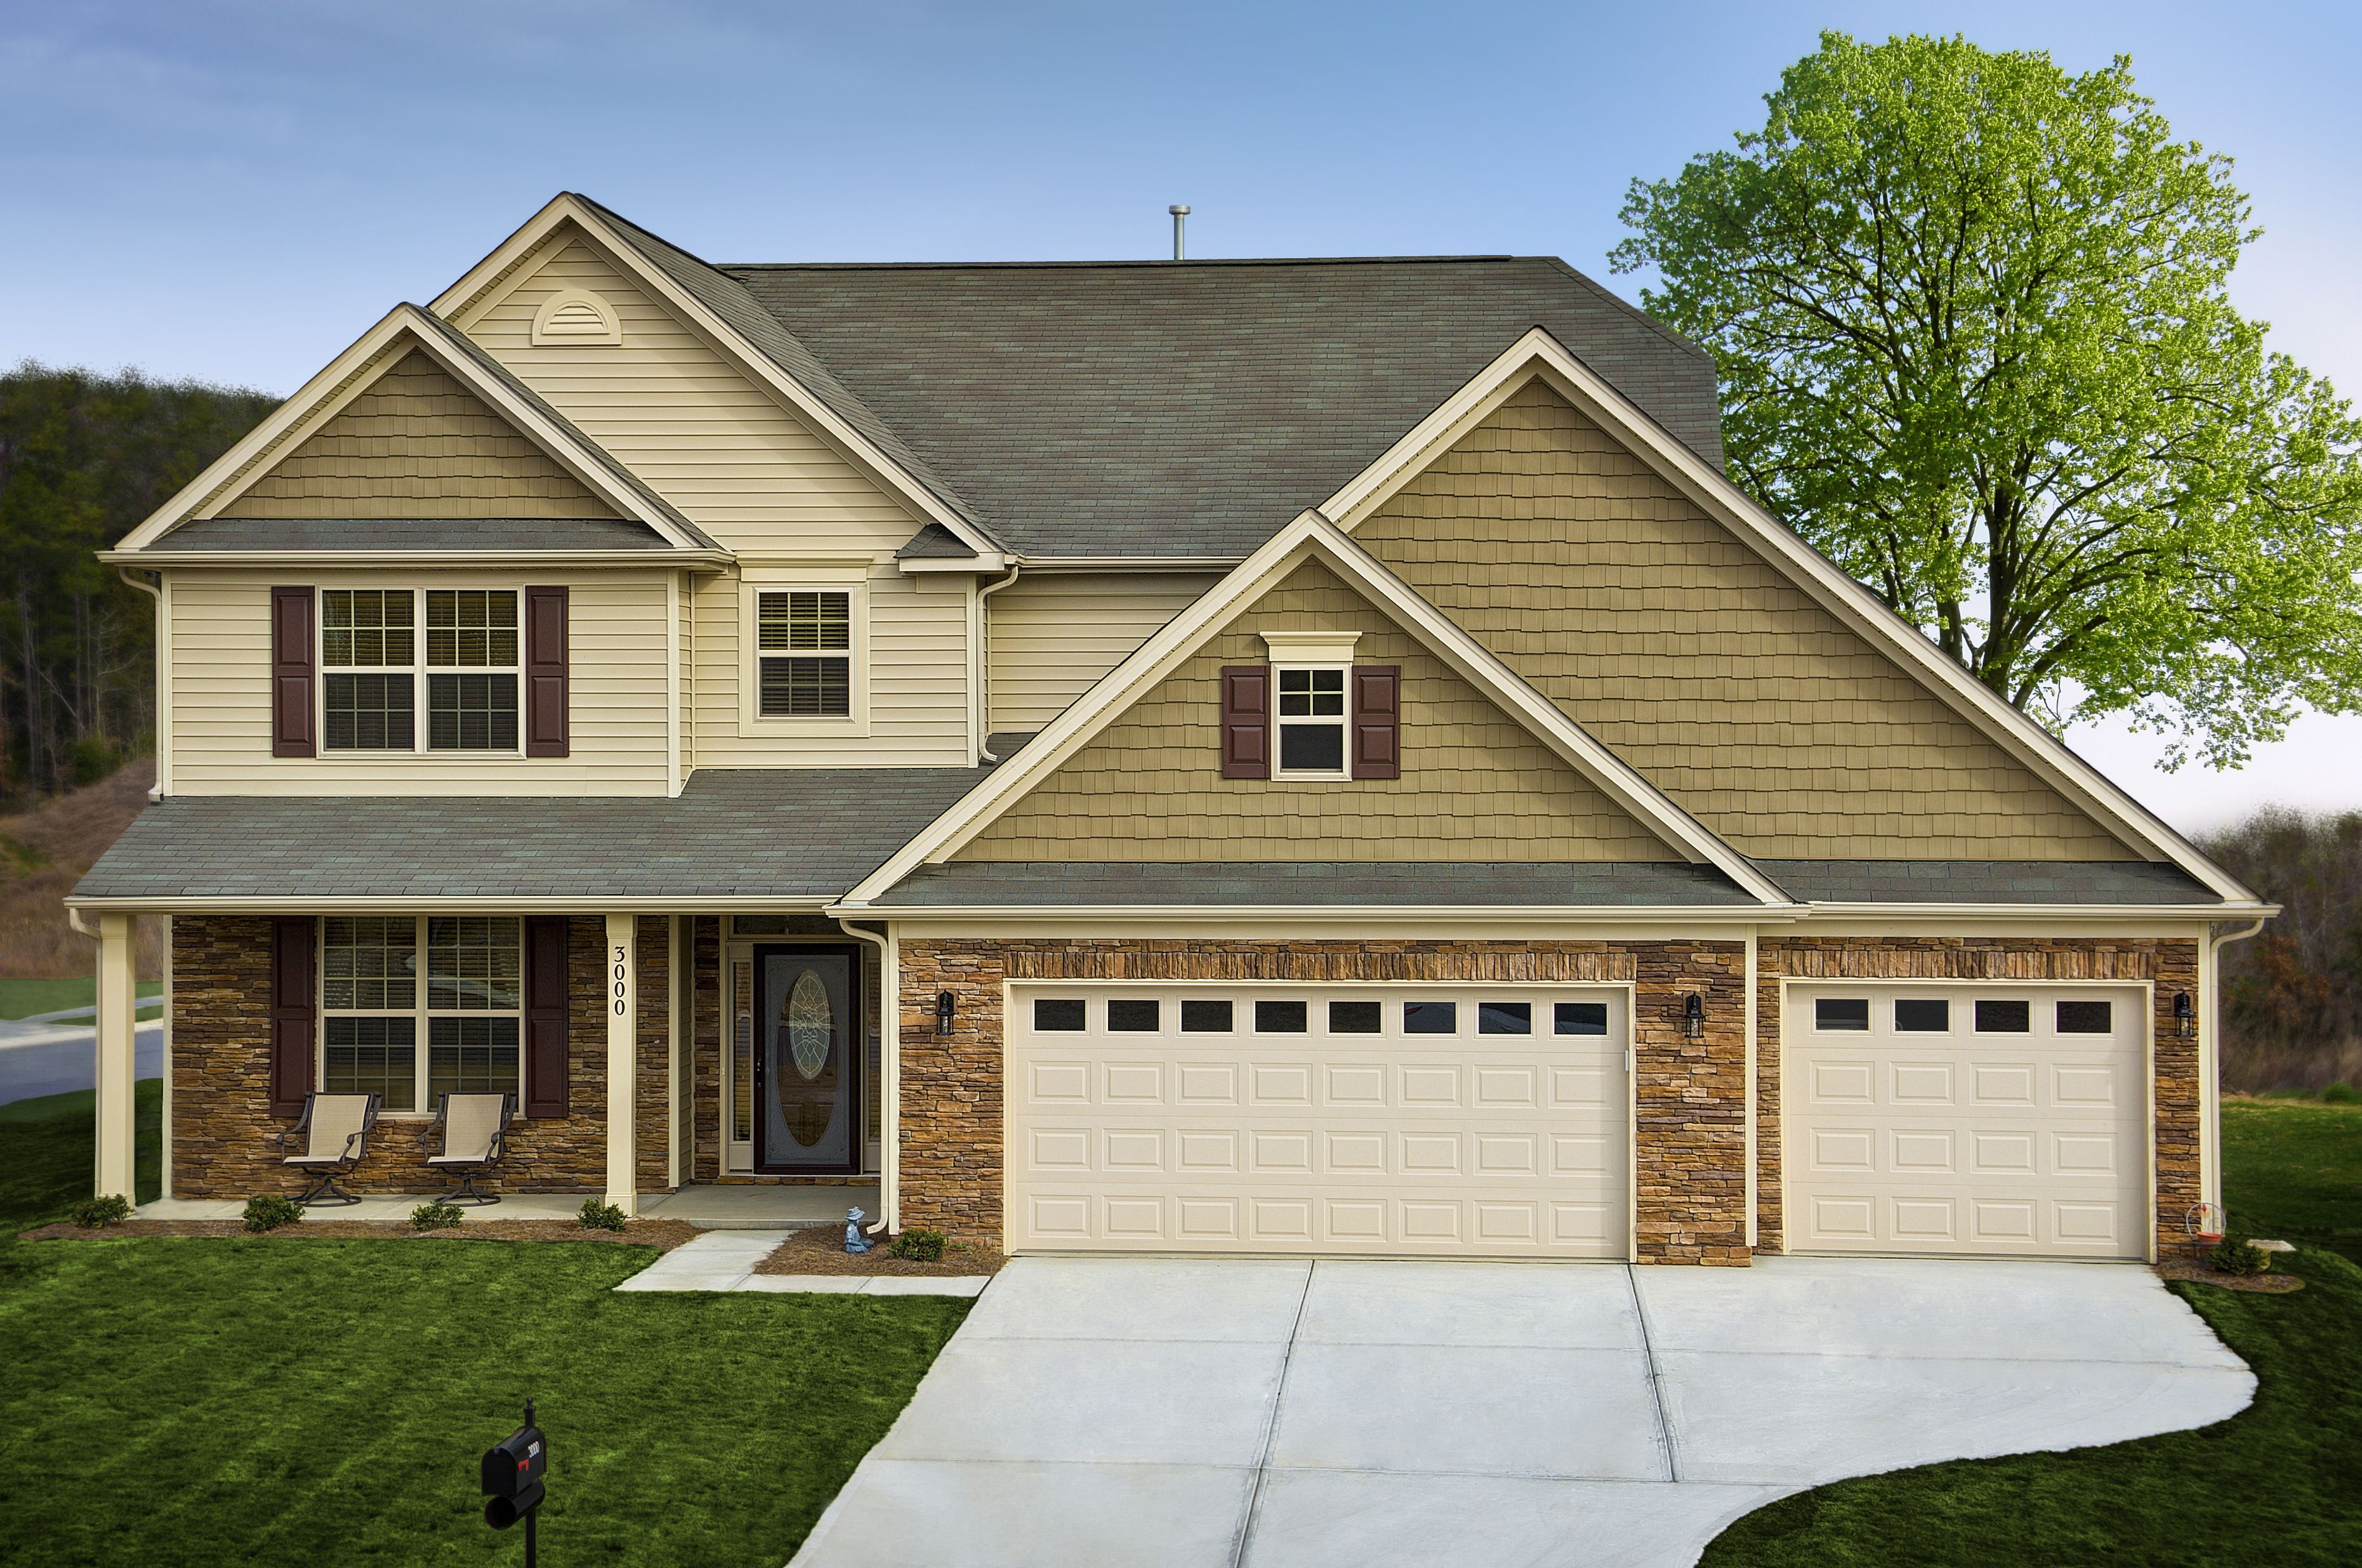 New Home in Charlotte NC Third Car Garage